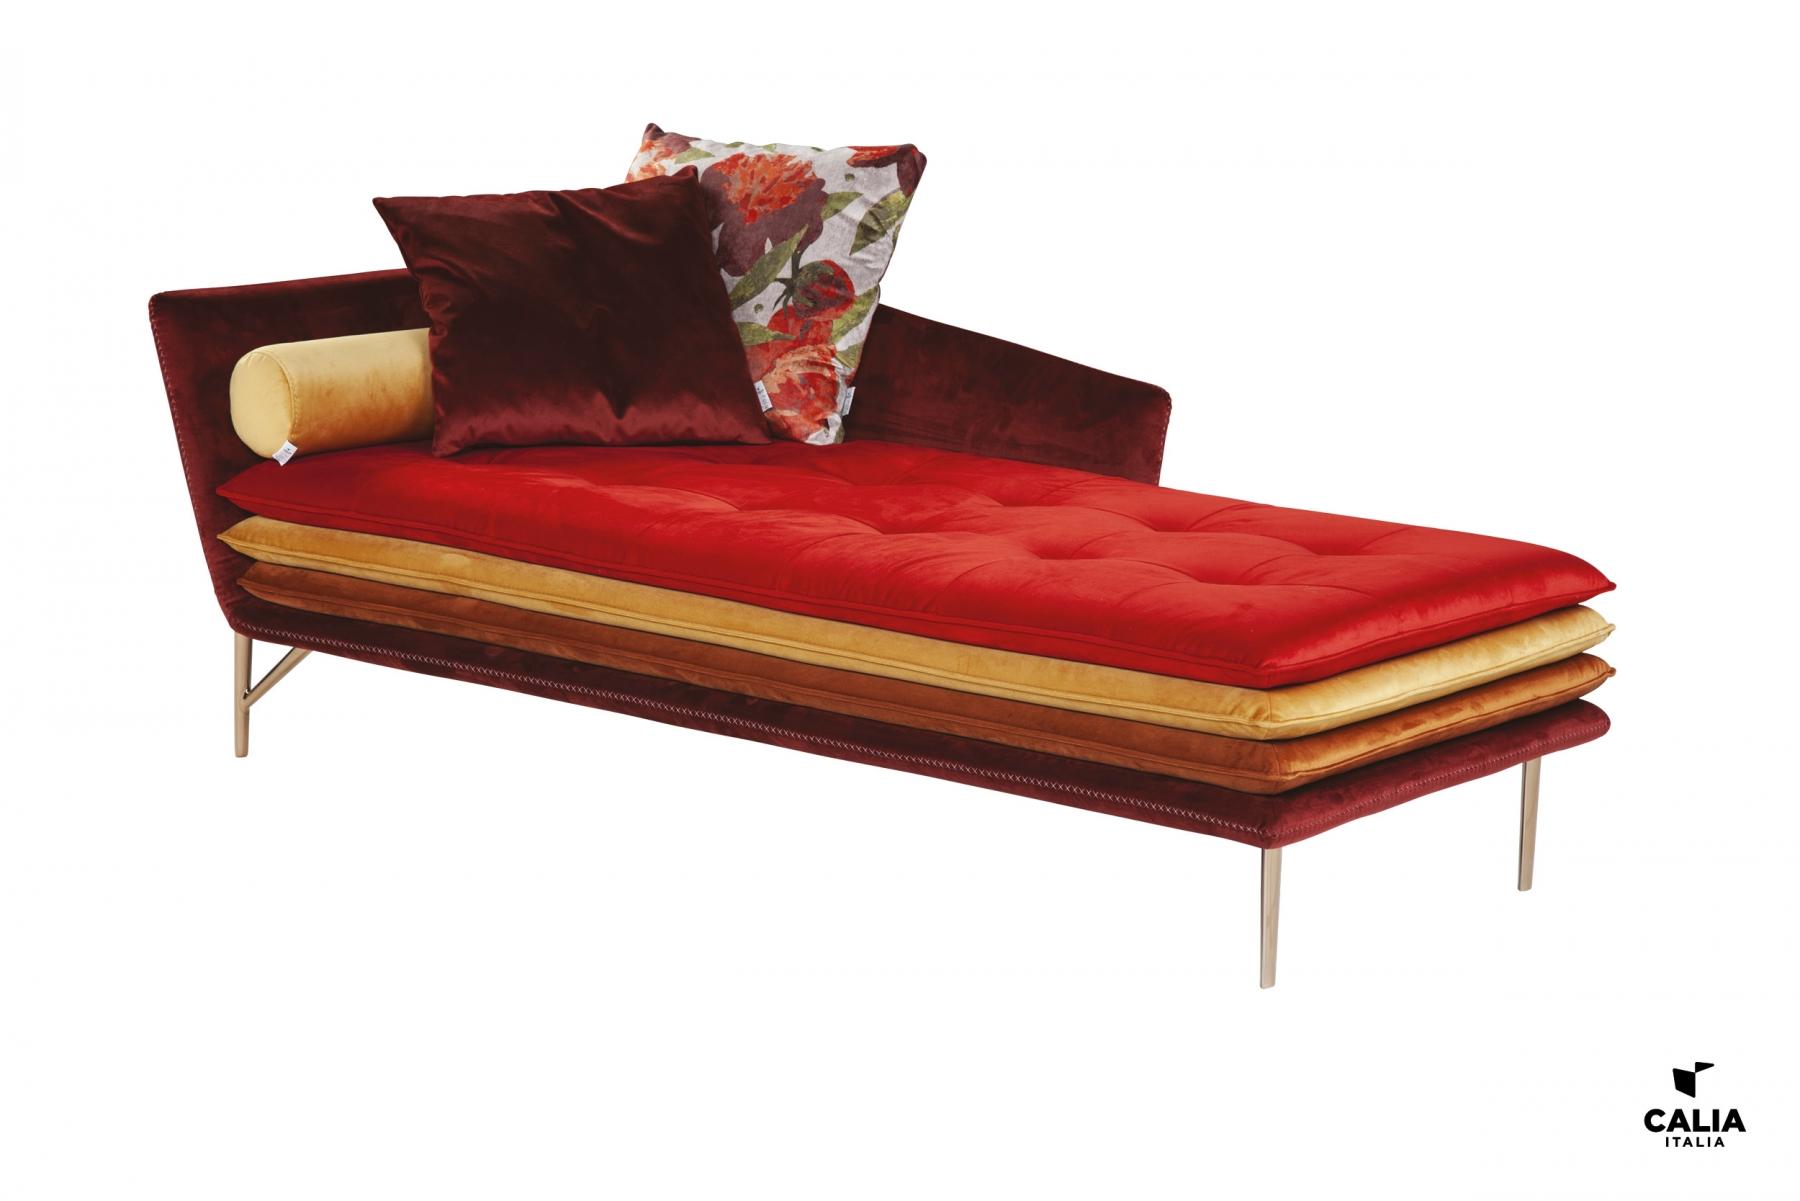 Caliaitalia - Mater Familias Day Bed